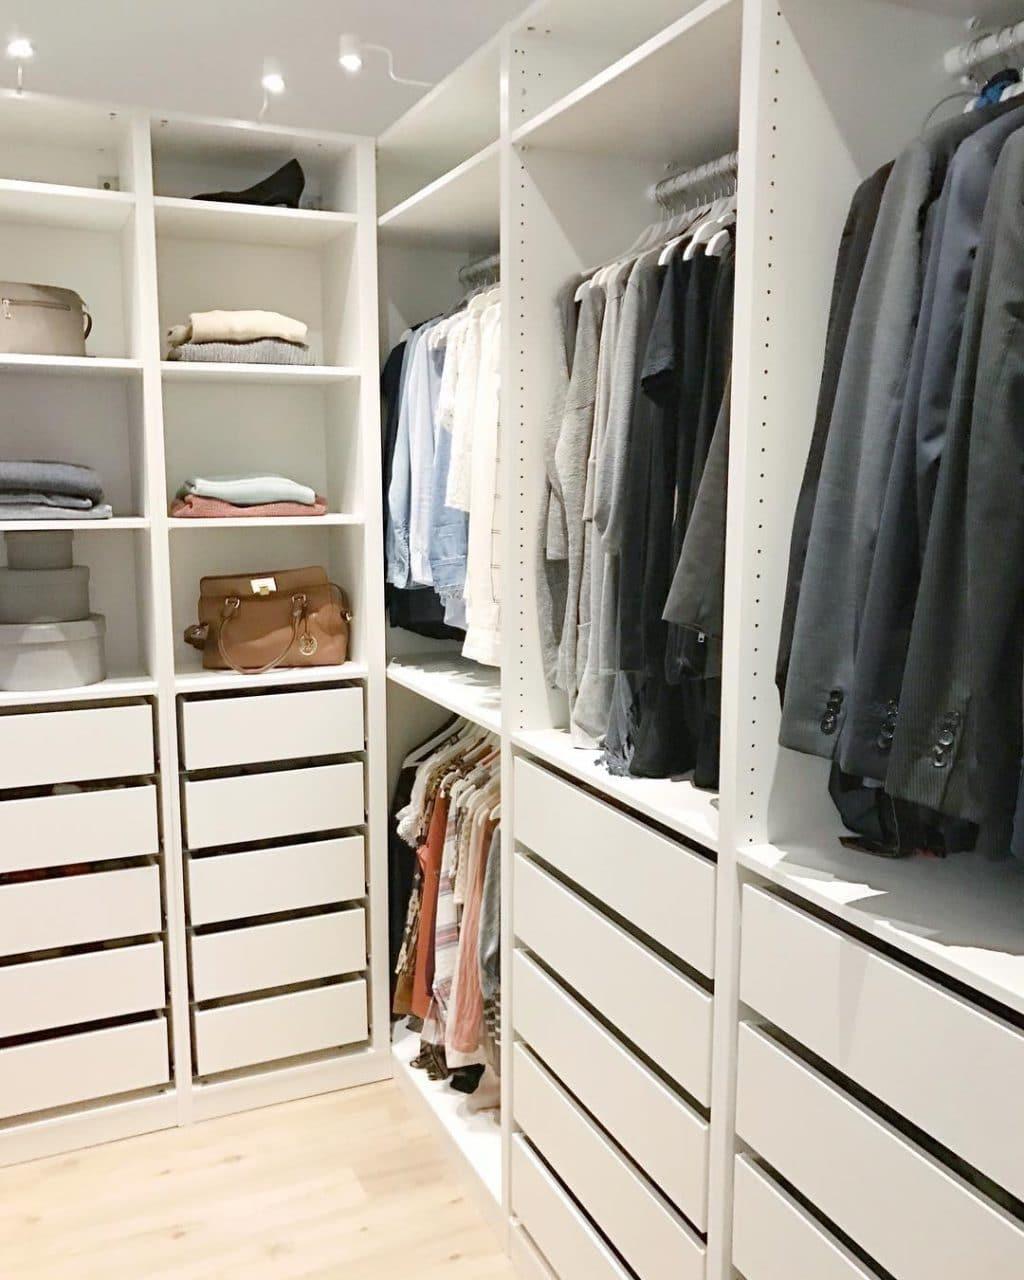 IKEA Closet Inspiration - Crazy Wonderful